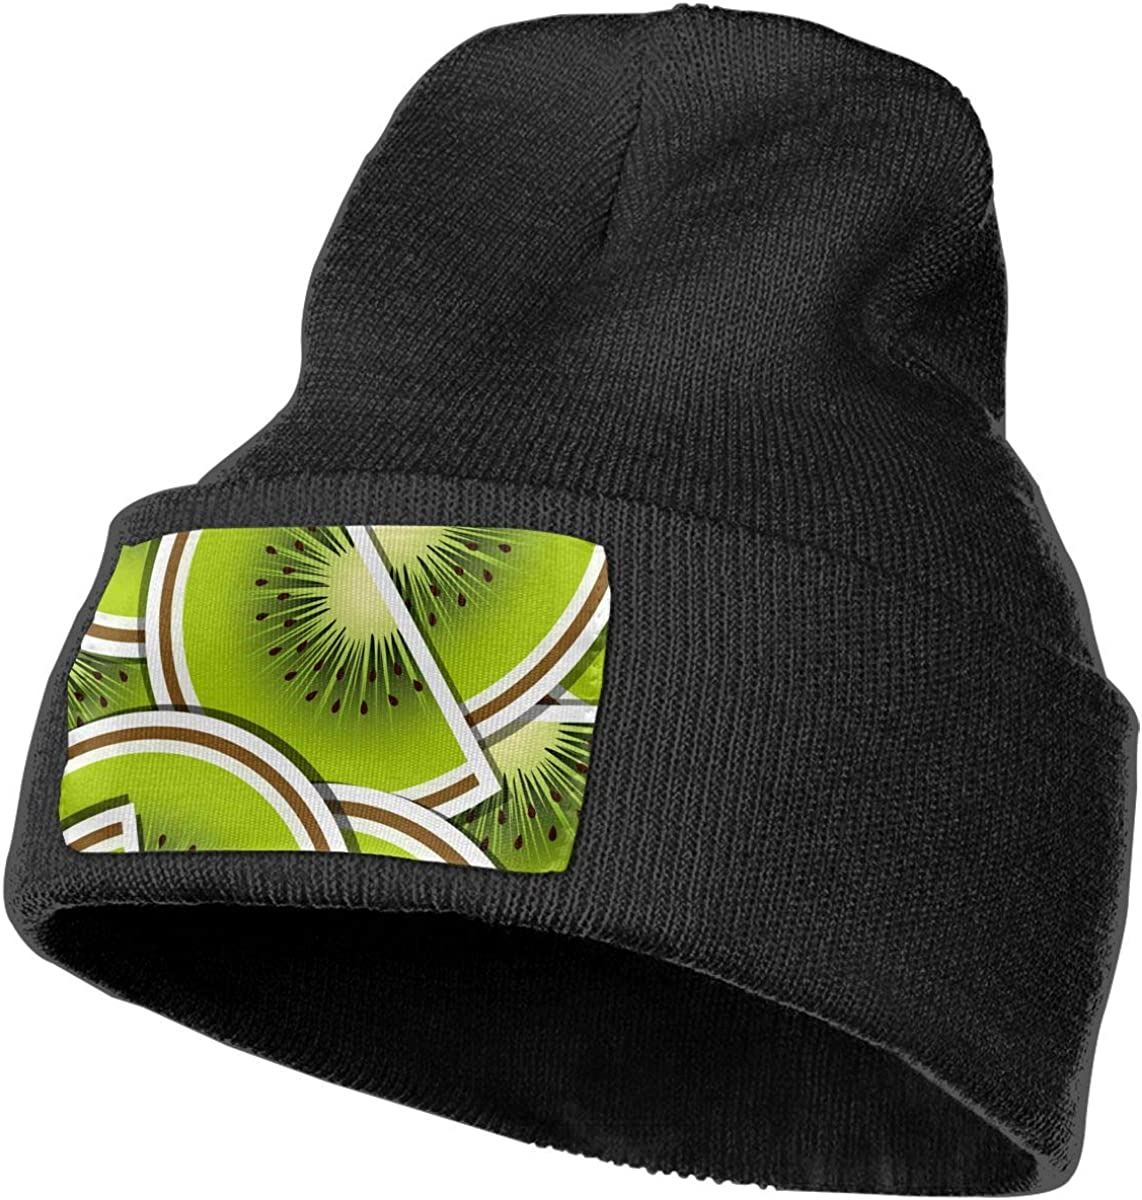 G-Fulling Planet Woolen Hat Unisex Beanie Hat Warm Hats Skull Cap Knitted Hat